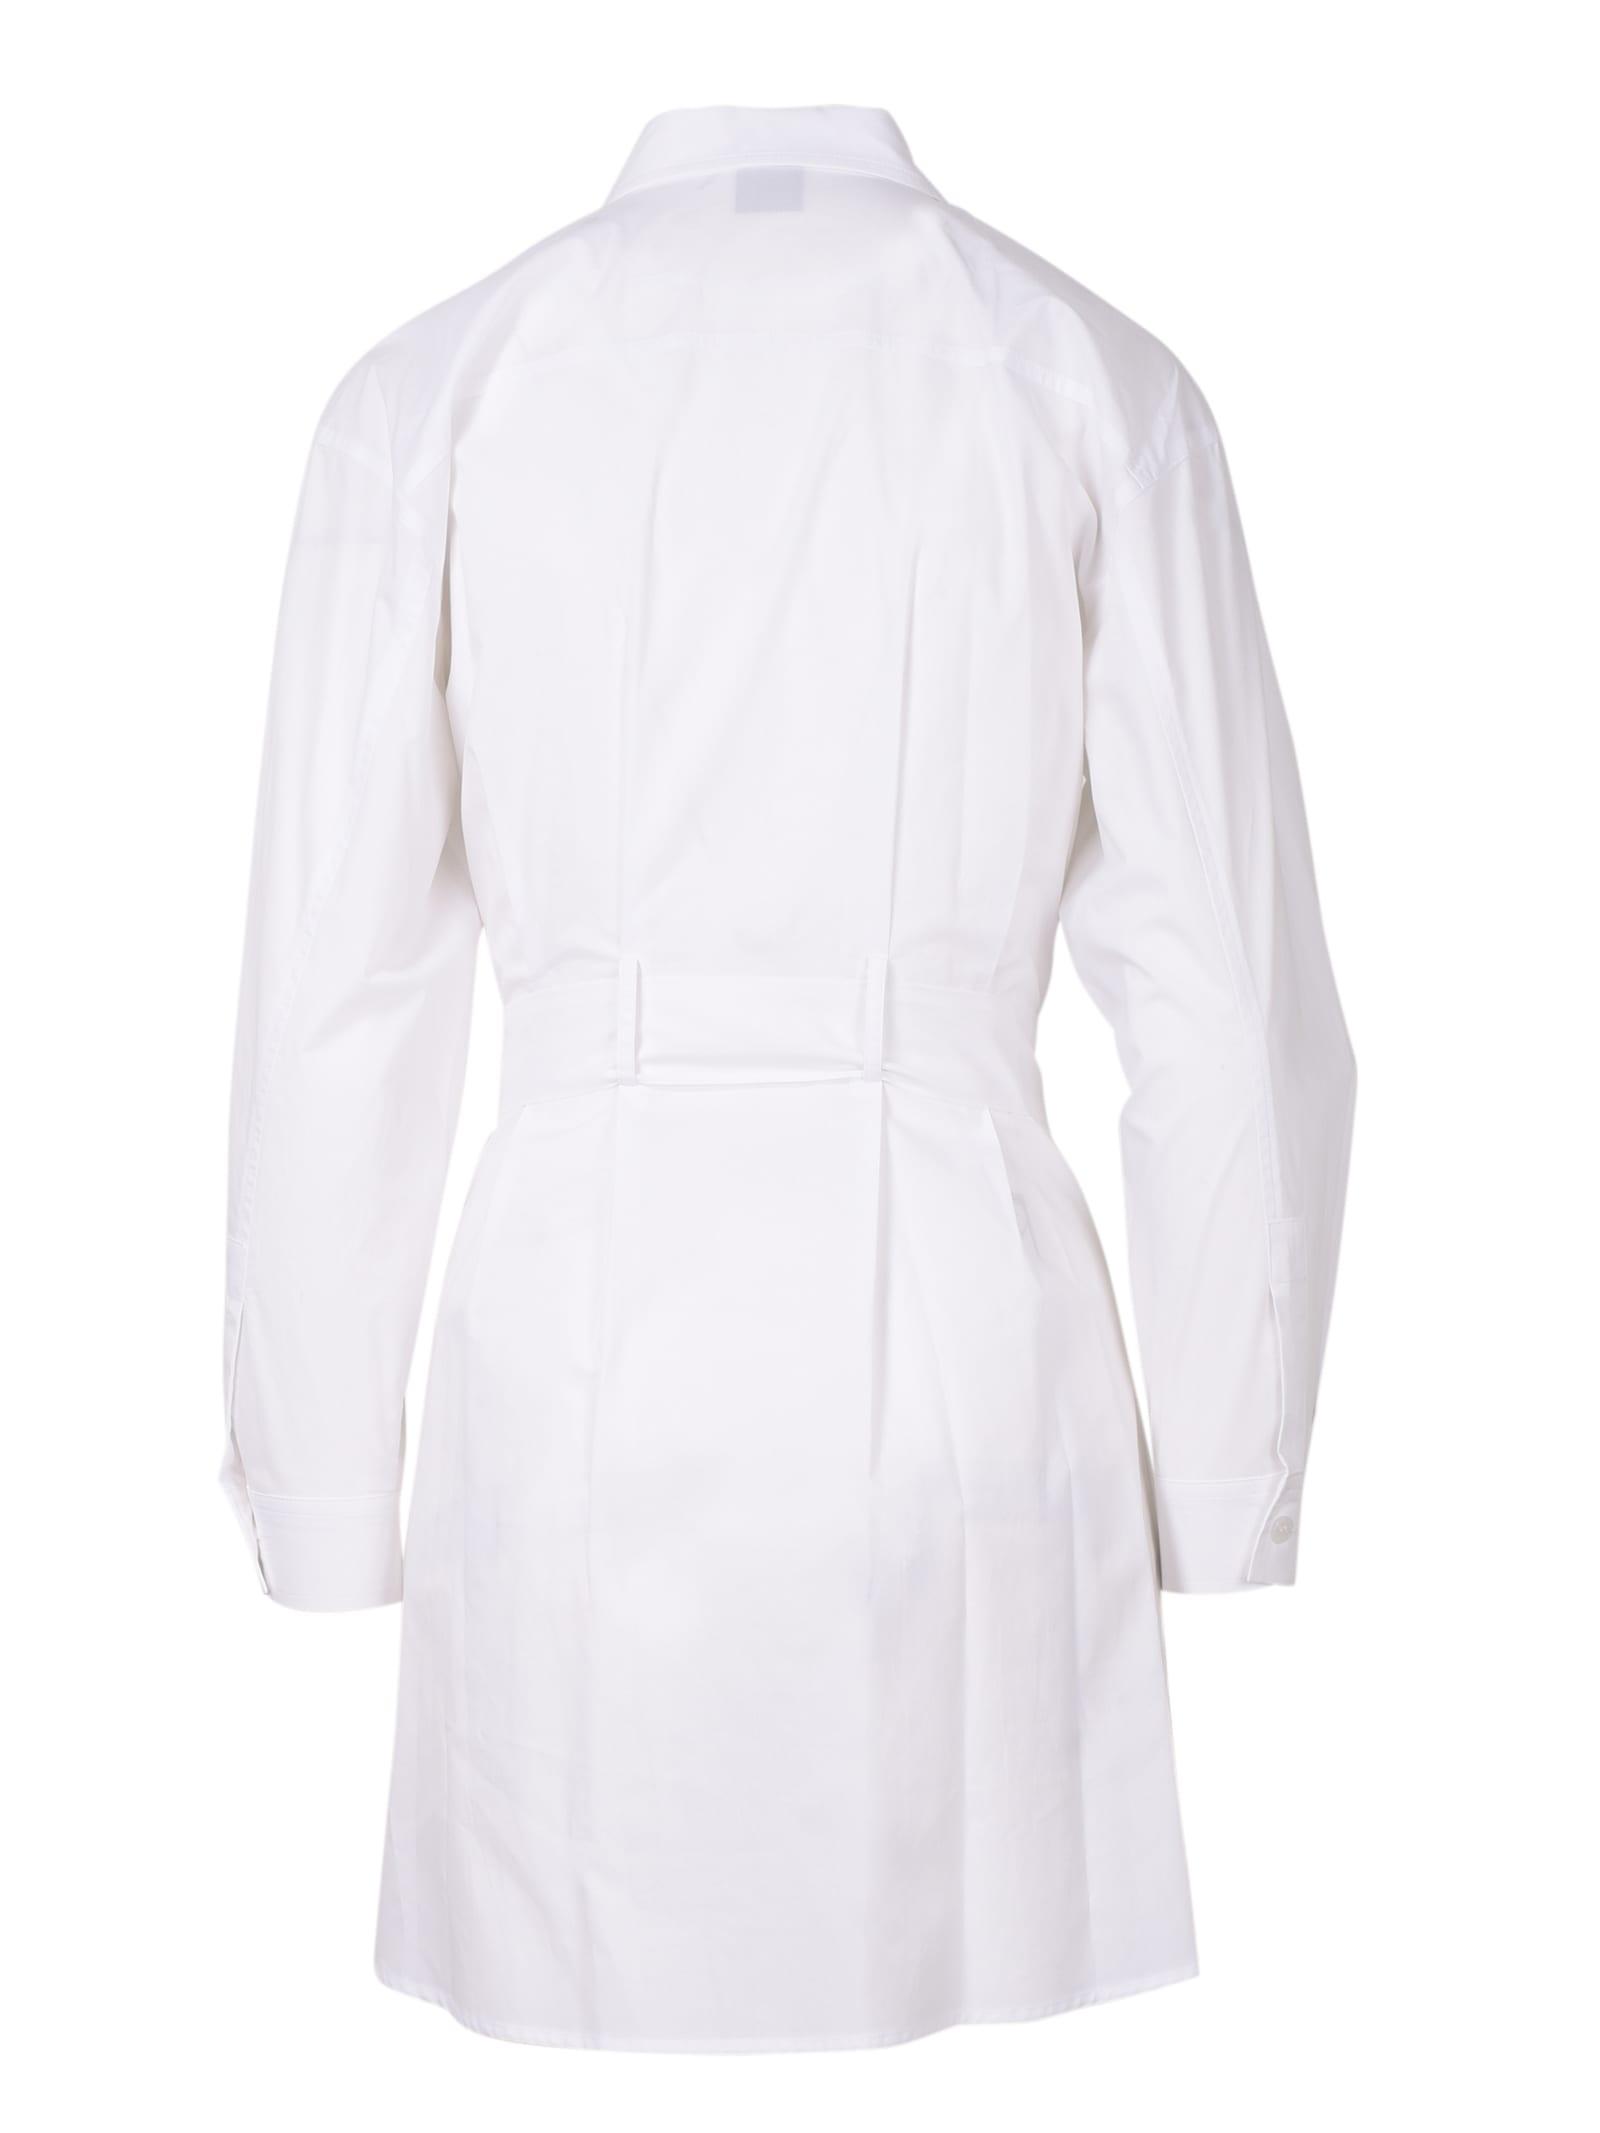 Pinko FANATICO CHEMISIER DRESS